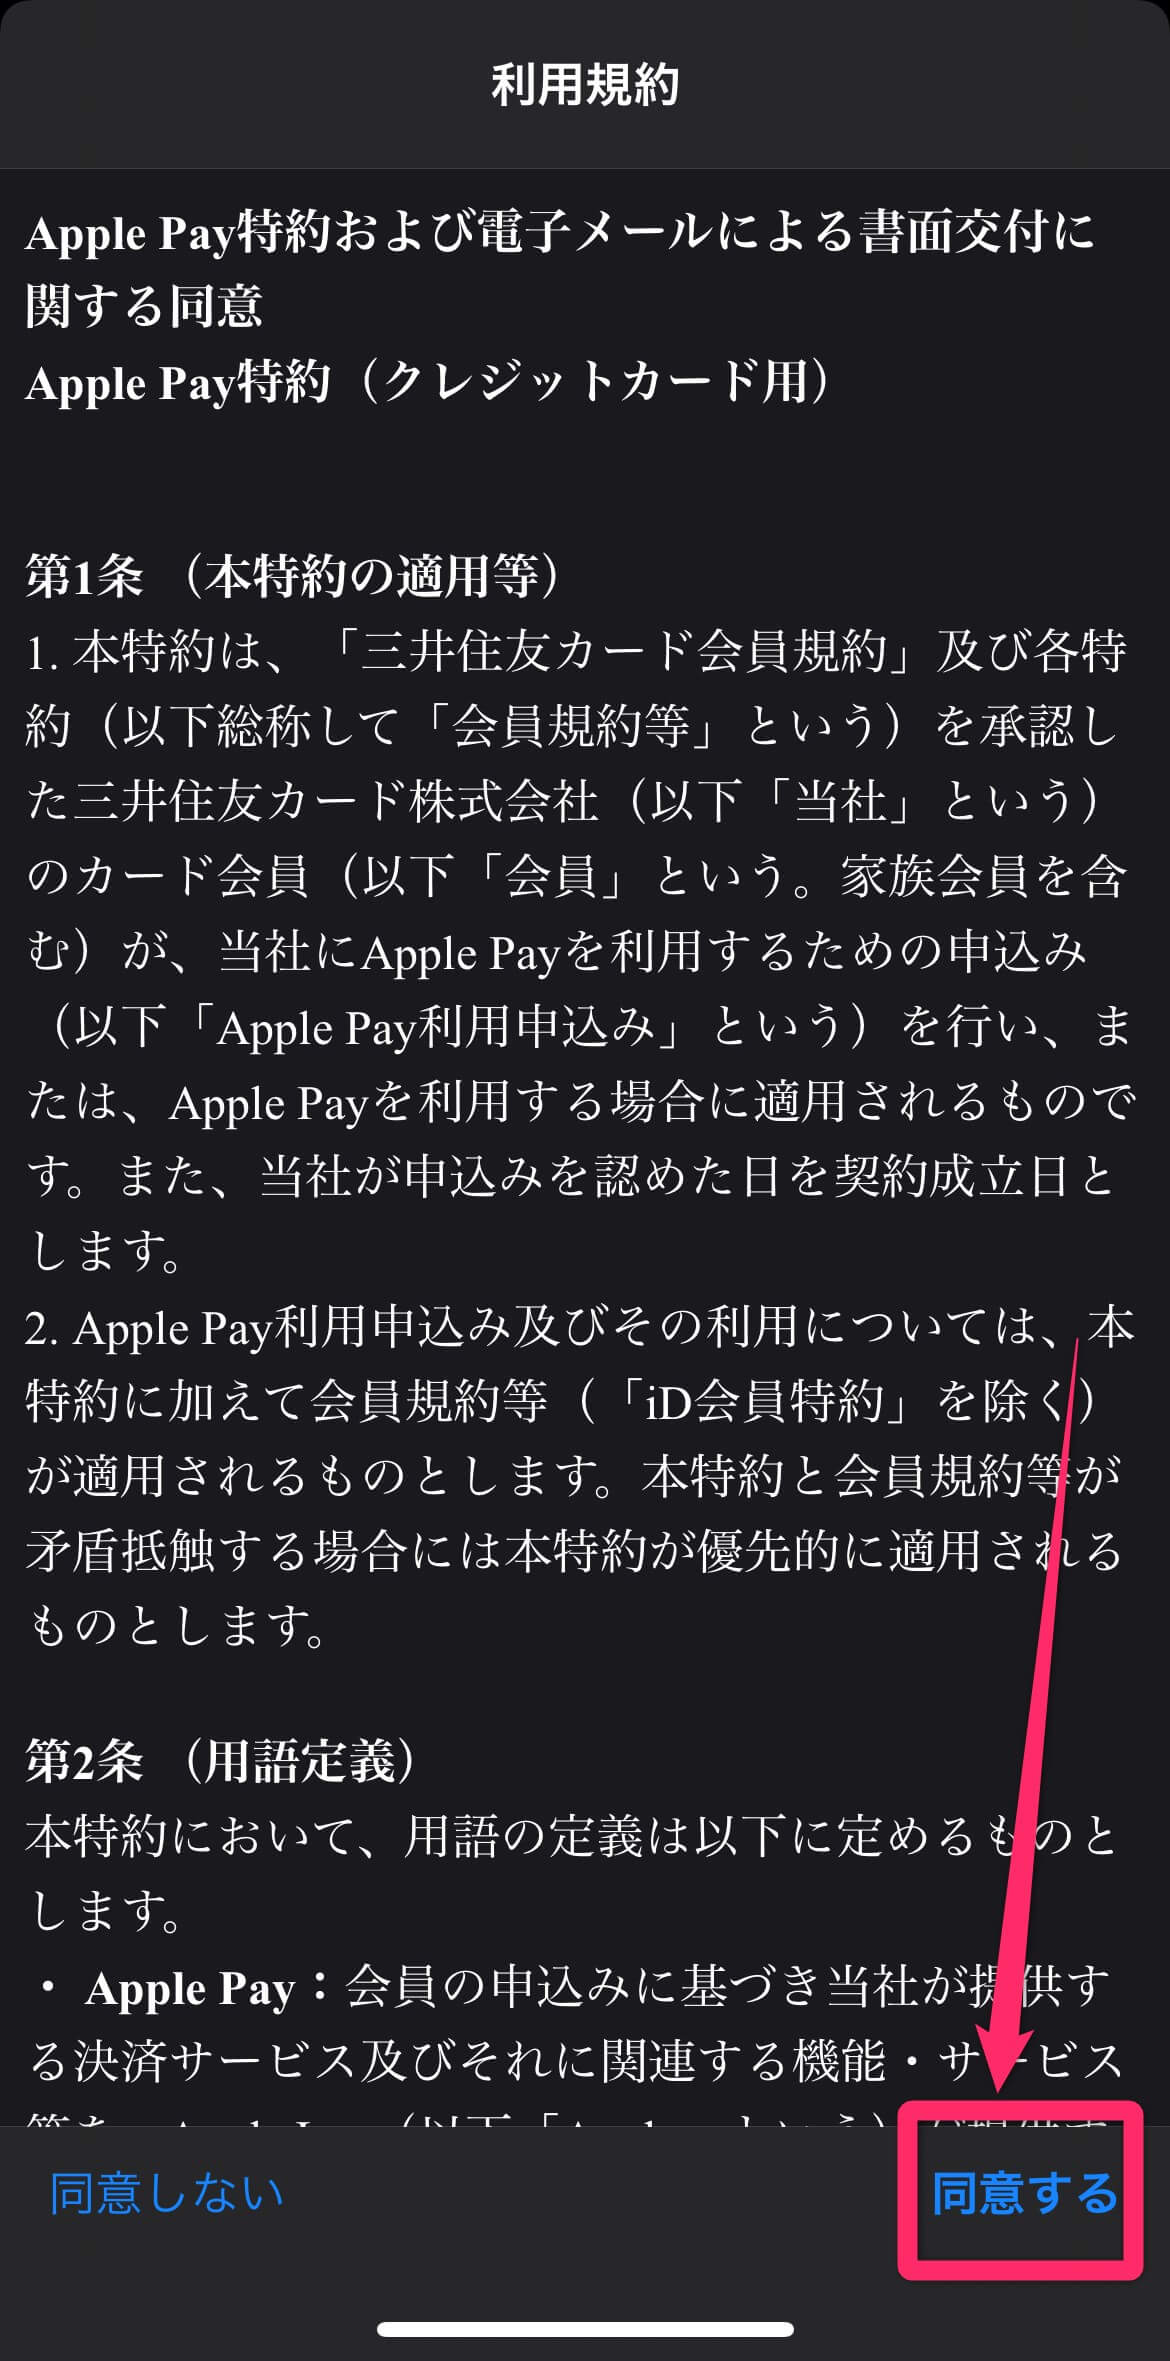 Apple Pay設定方法